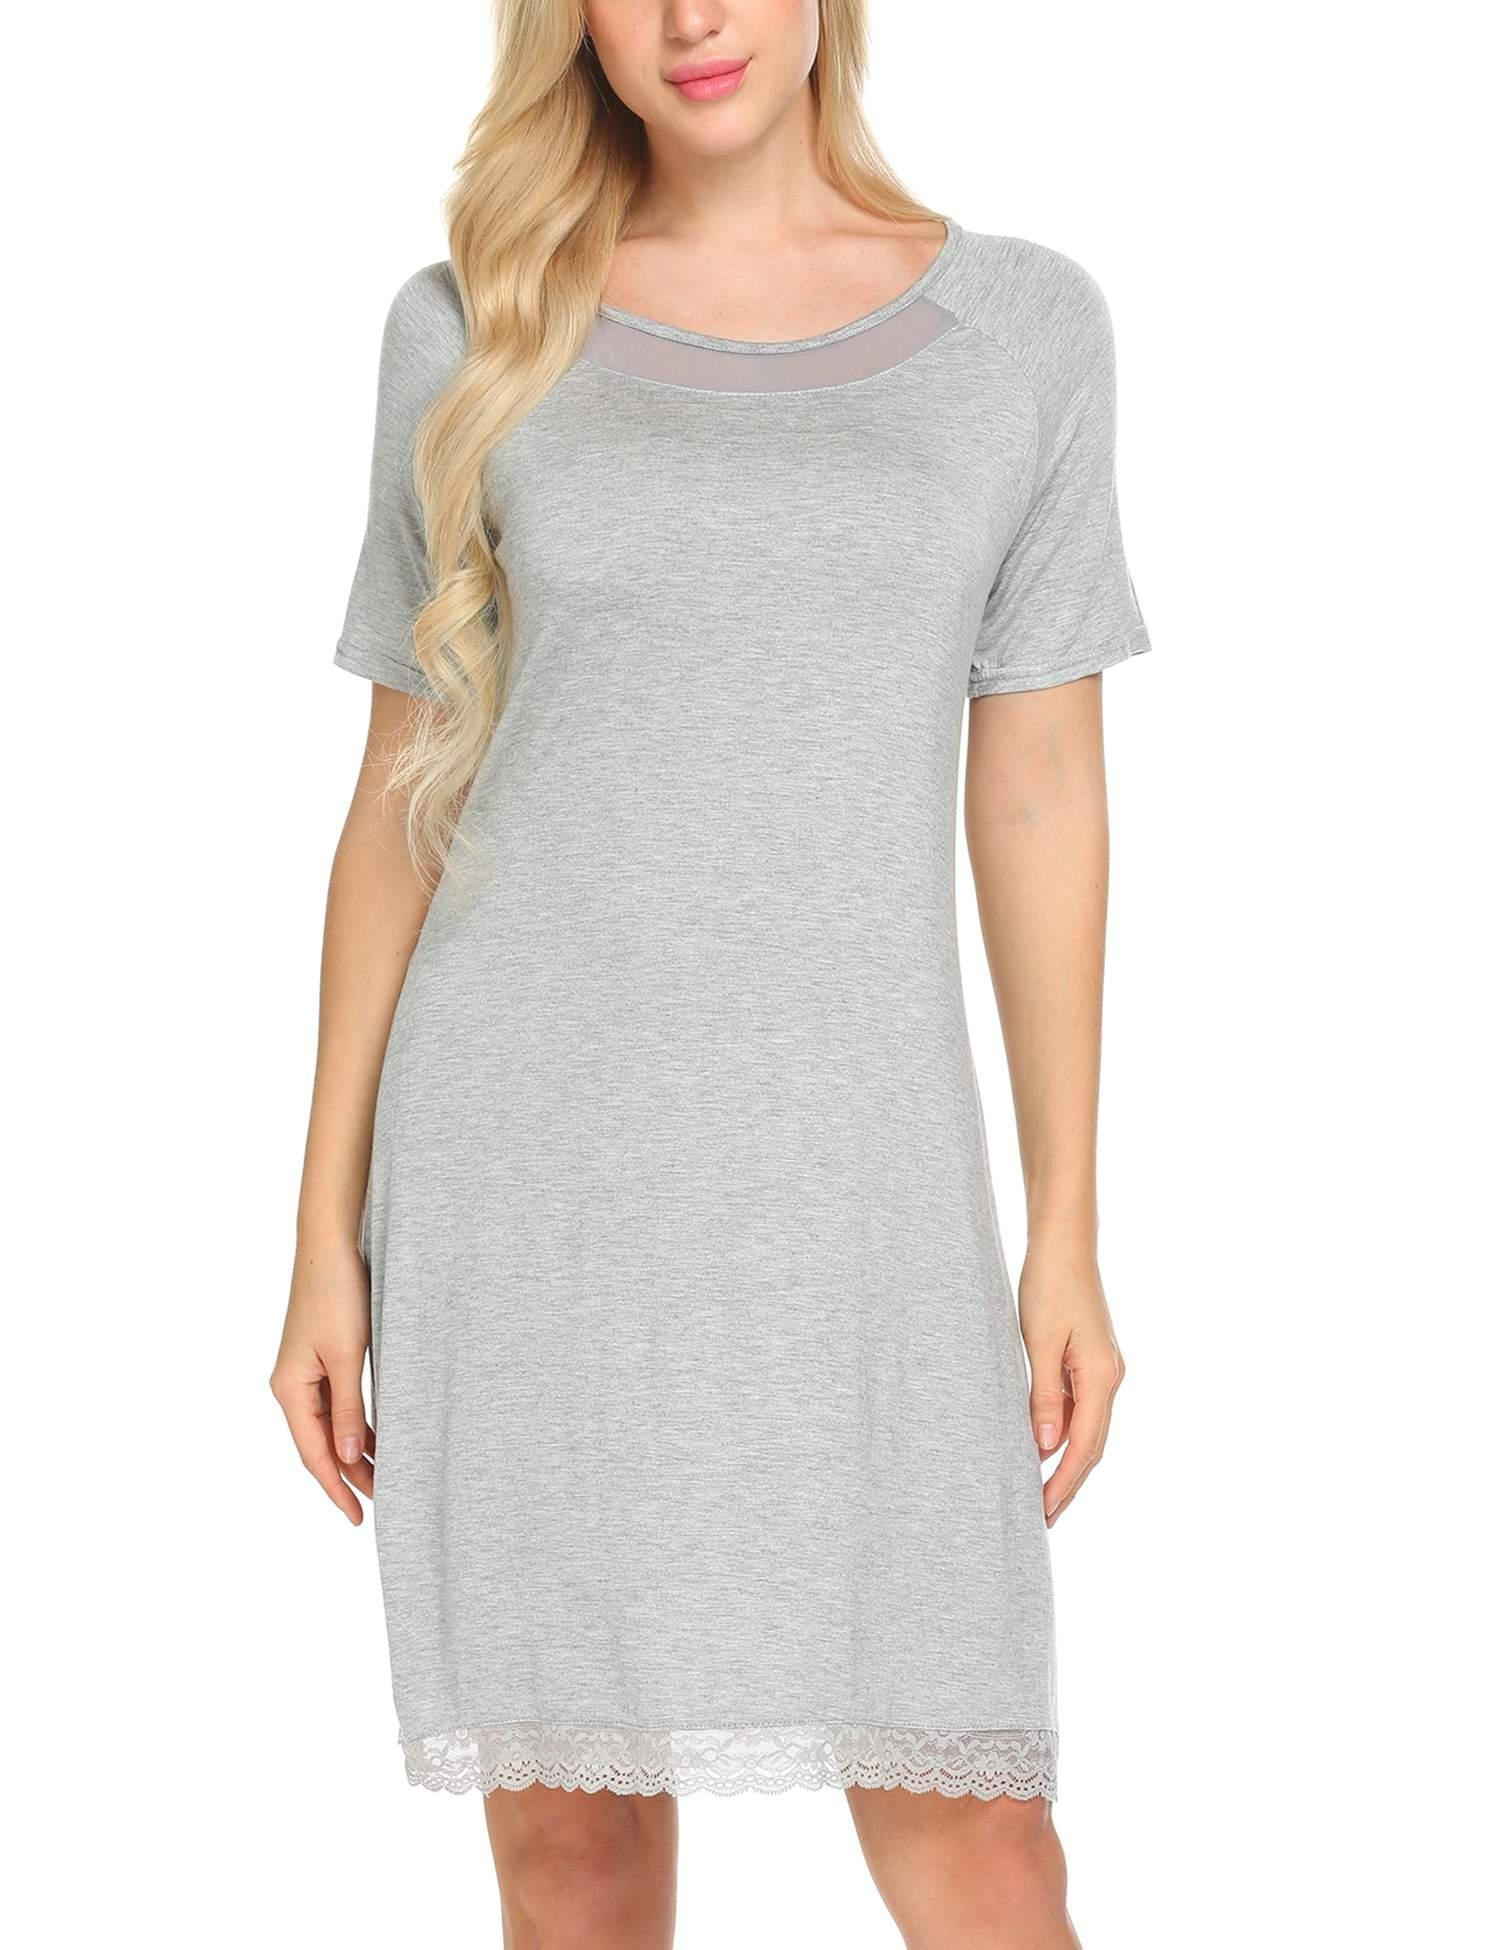 Ekouaer Women's Short Sleeve Nightwear Cotton Sleep Shirt (Grey,L)